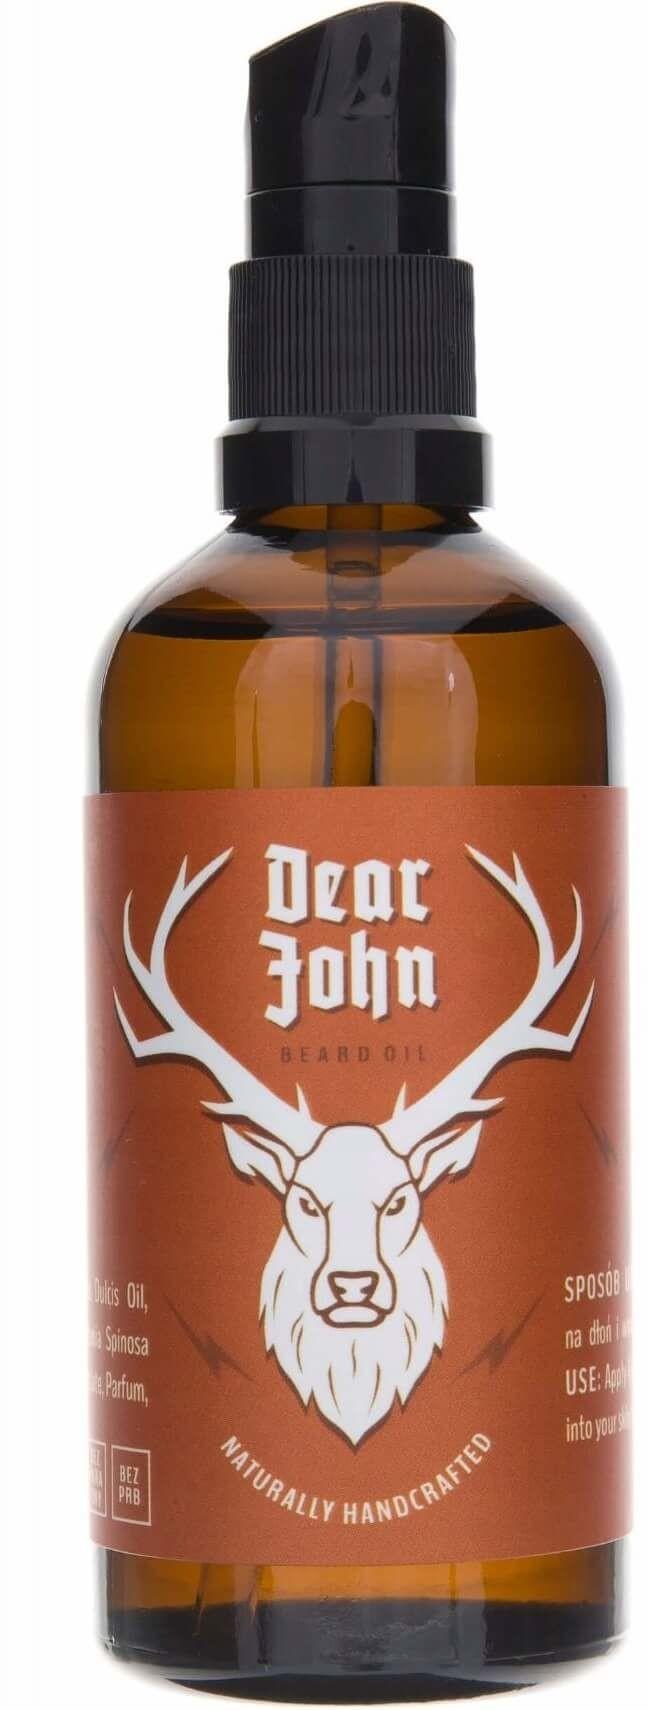 Pan Drwal Dear John orzeźwiający olejek do brody 100ml 15821